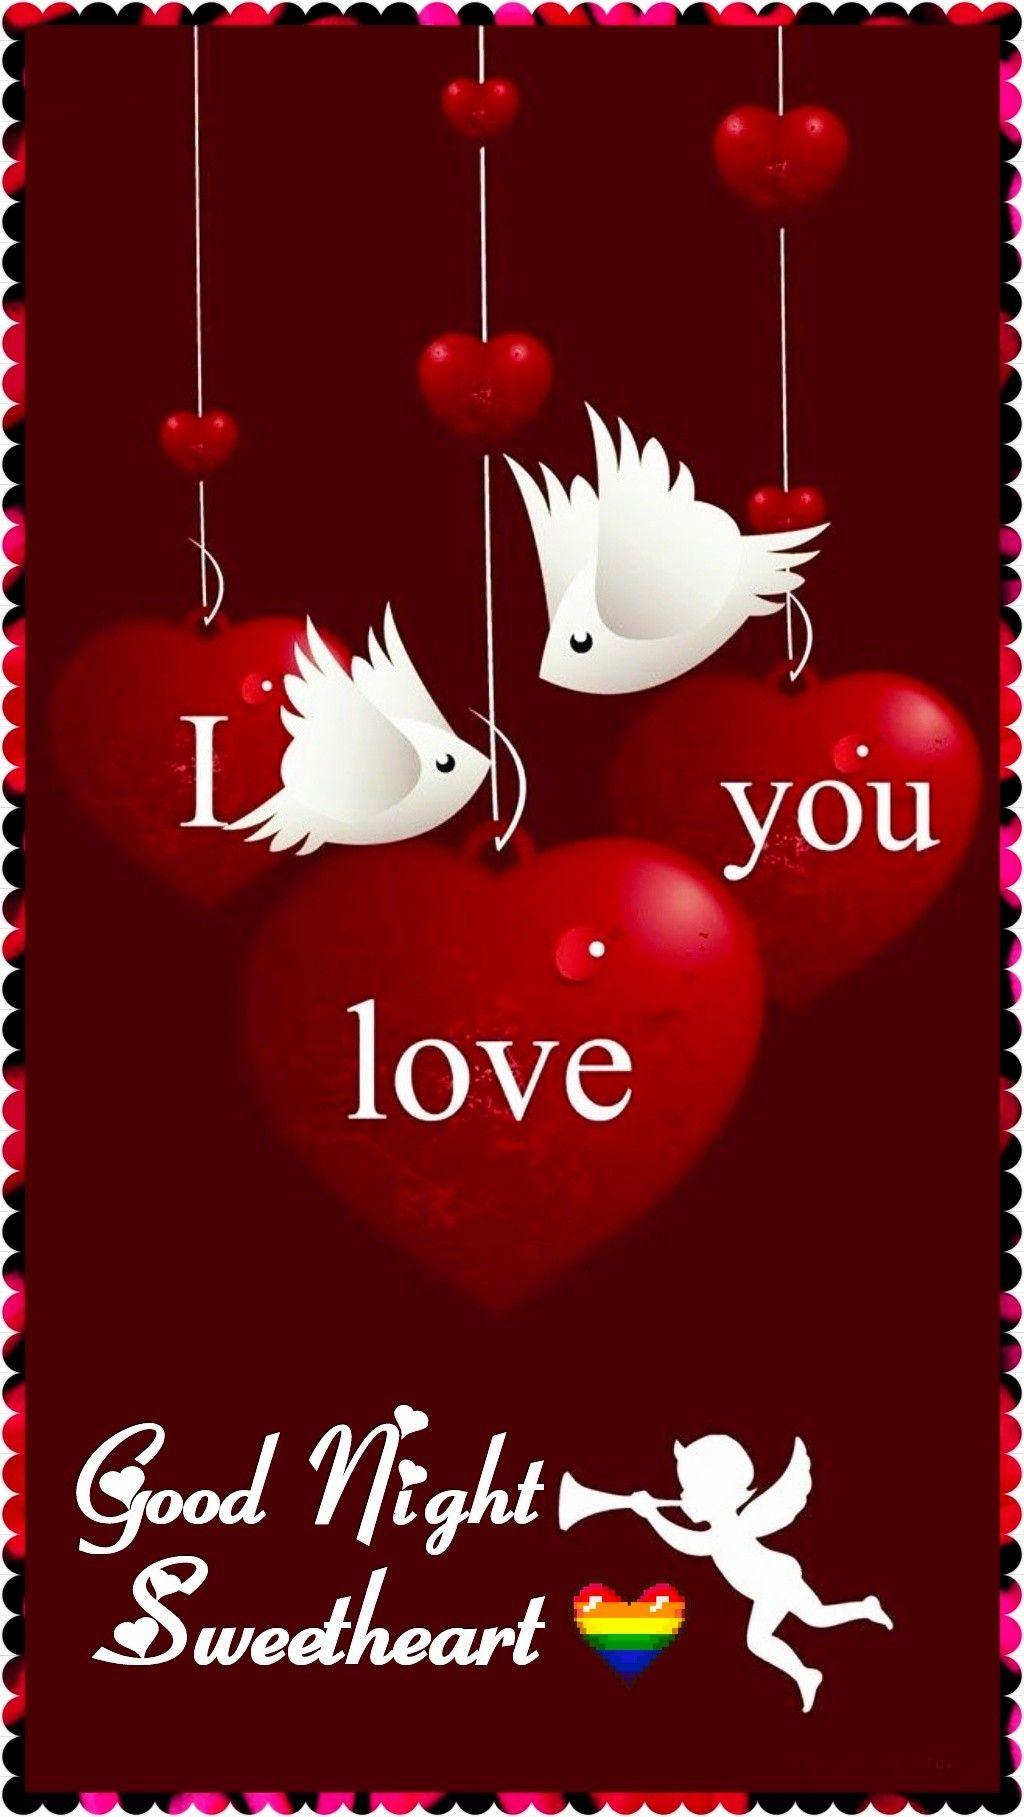 Pin By Srujana N On Good Nightsrj Love Wallpaper Valentines